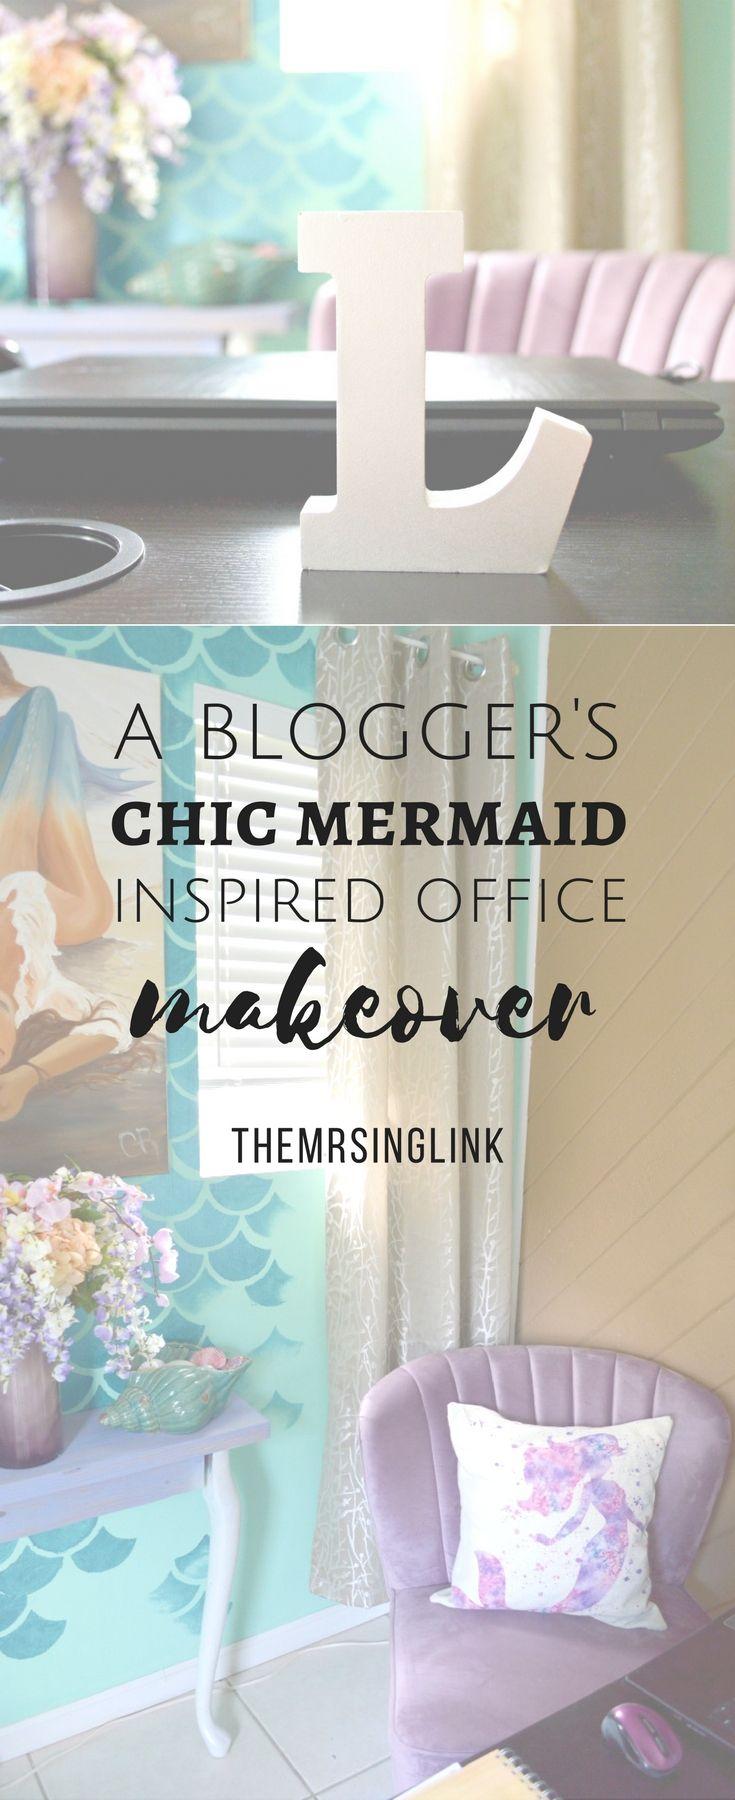 A Bloggeru0027s Chic Mermaid Inspired Office Makeover | Chic Mermaid Decor |  Chic Beach Office Makeover | Office Ideas | Office Decor Ideas | Beach Decor  Ideas ...